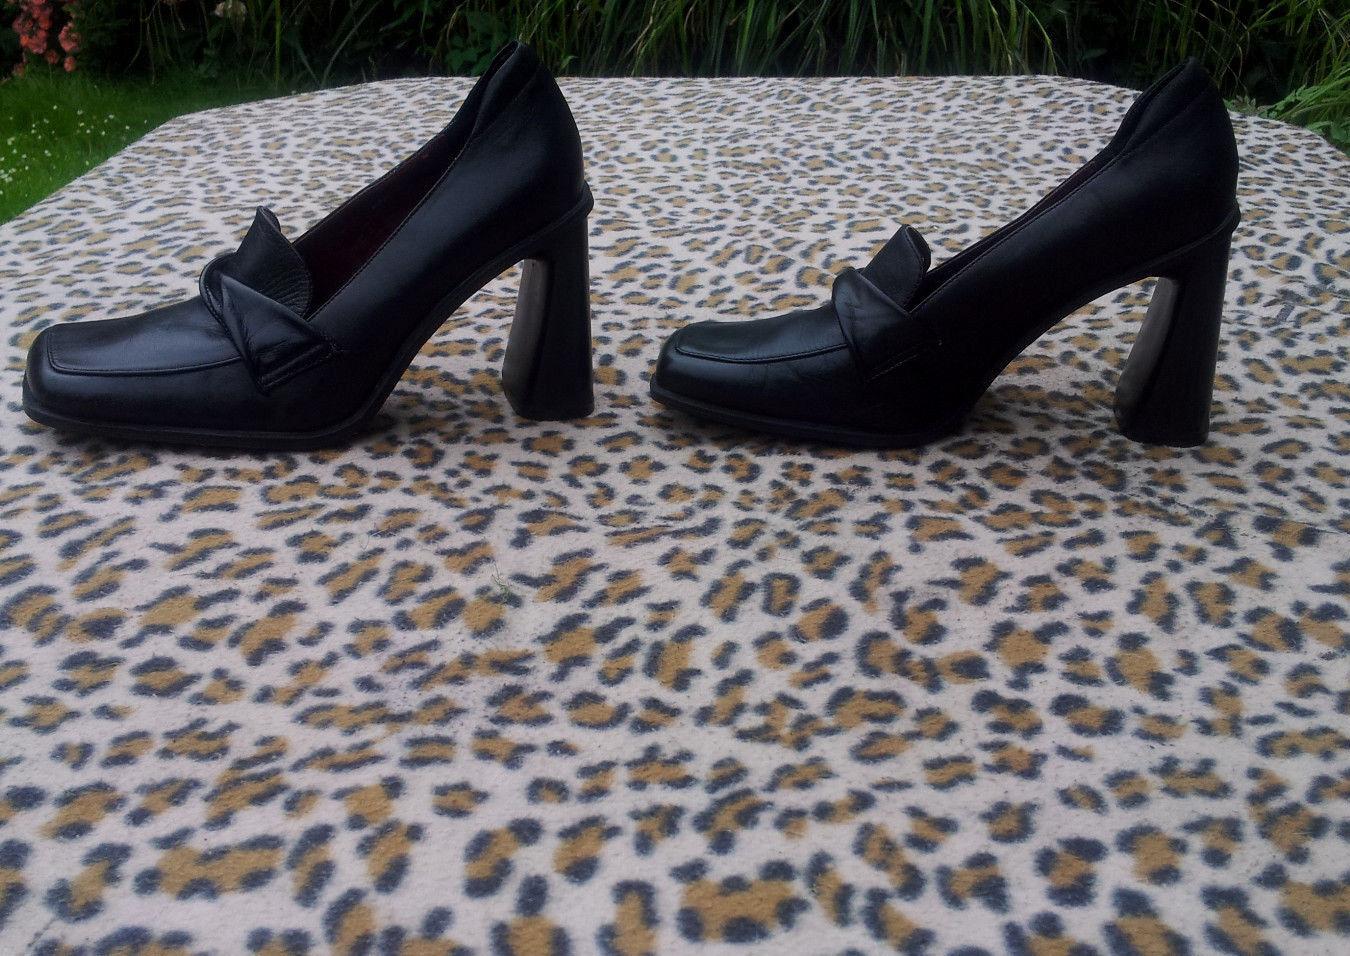 Vintage CREAZIONI ROMANINI BLACK Schuhe 38, SIZE 38, Schuhe UK 5 e5779a